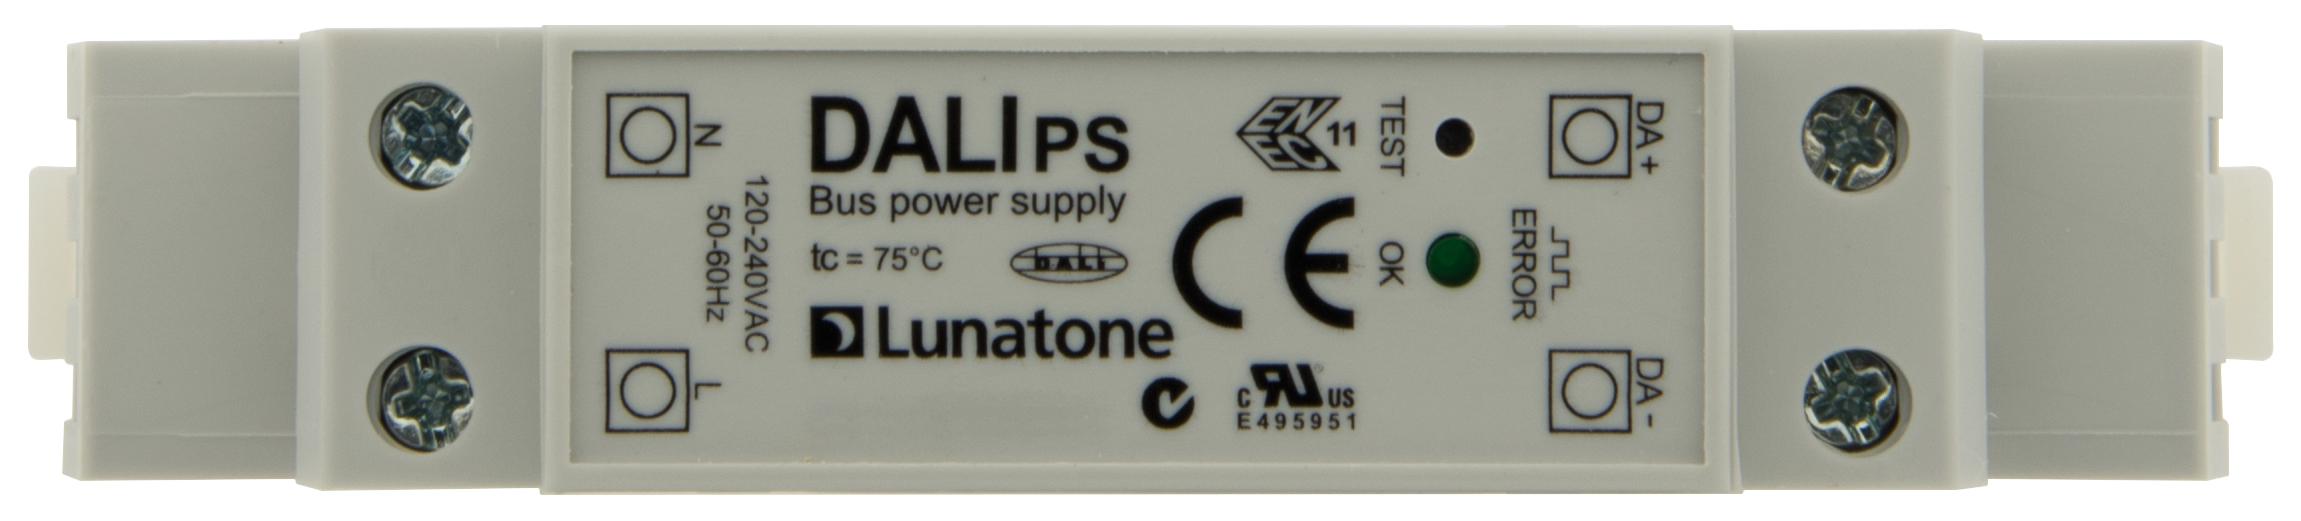 1 Stk DALI PS Bus Stromversorgung - DIN Rail Montage LILC004200